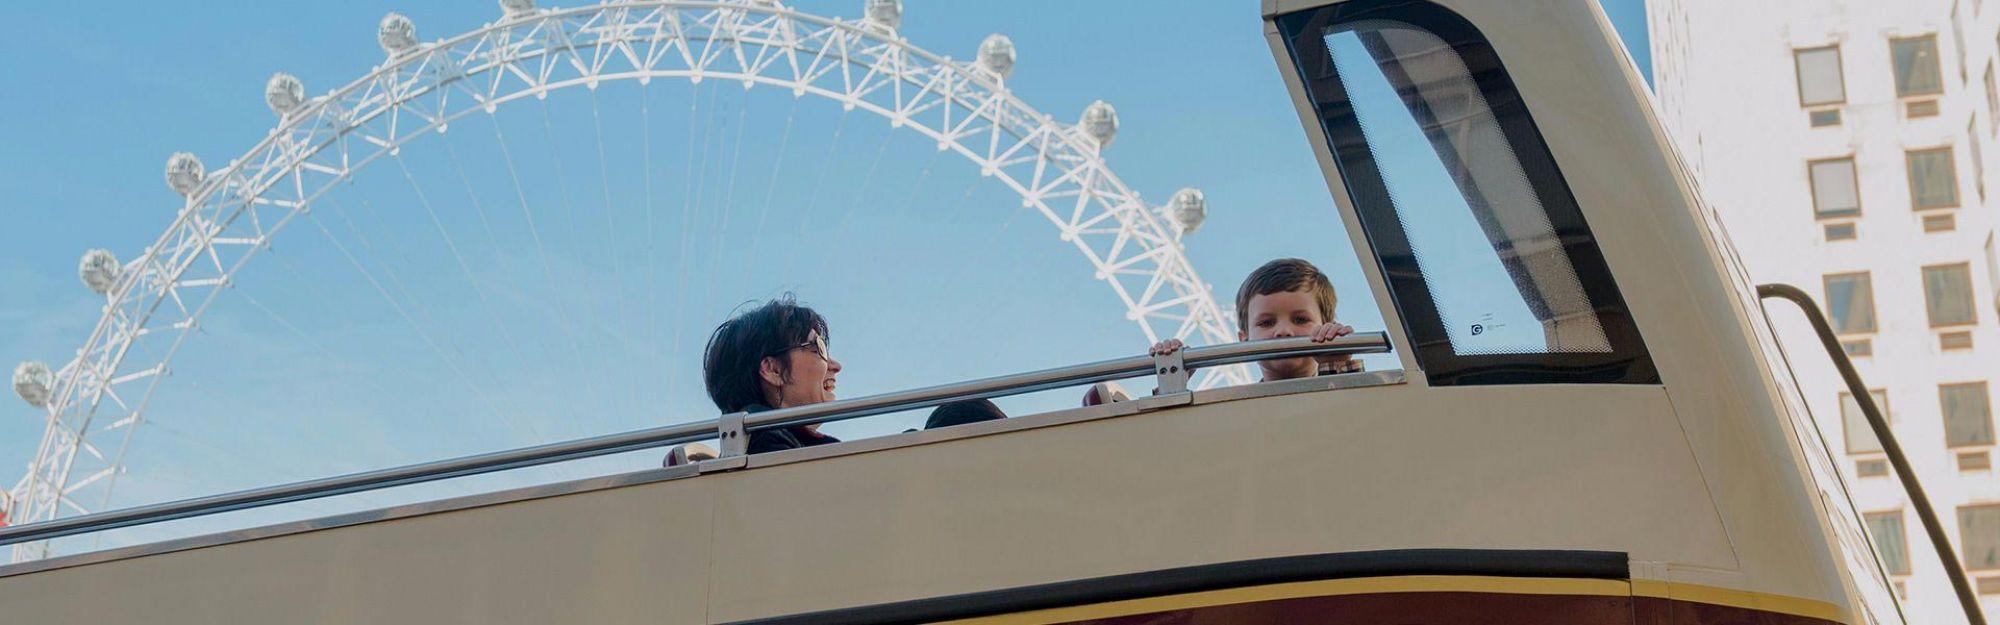 London Classic-Ticket plus London Eye - Standard-Eintritt